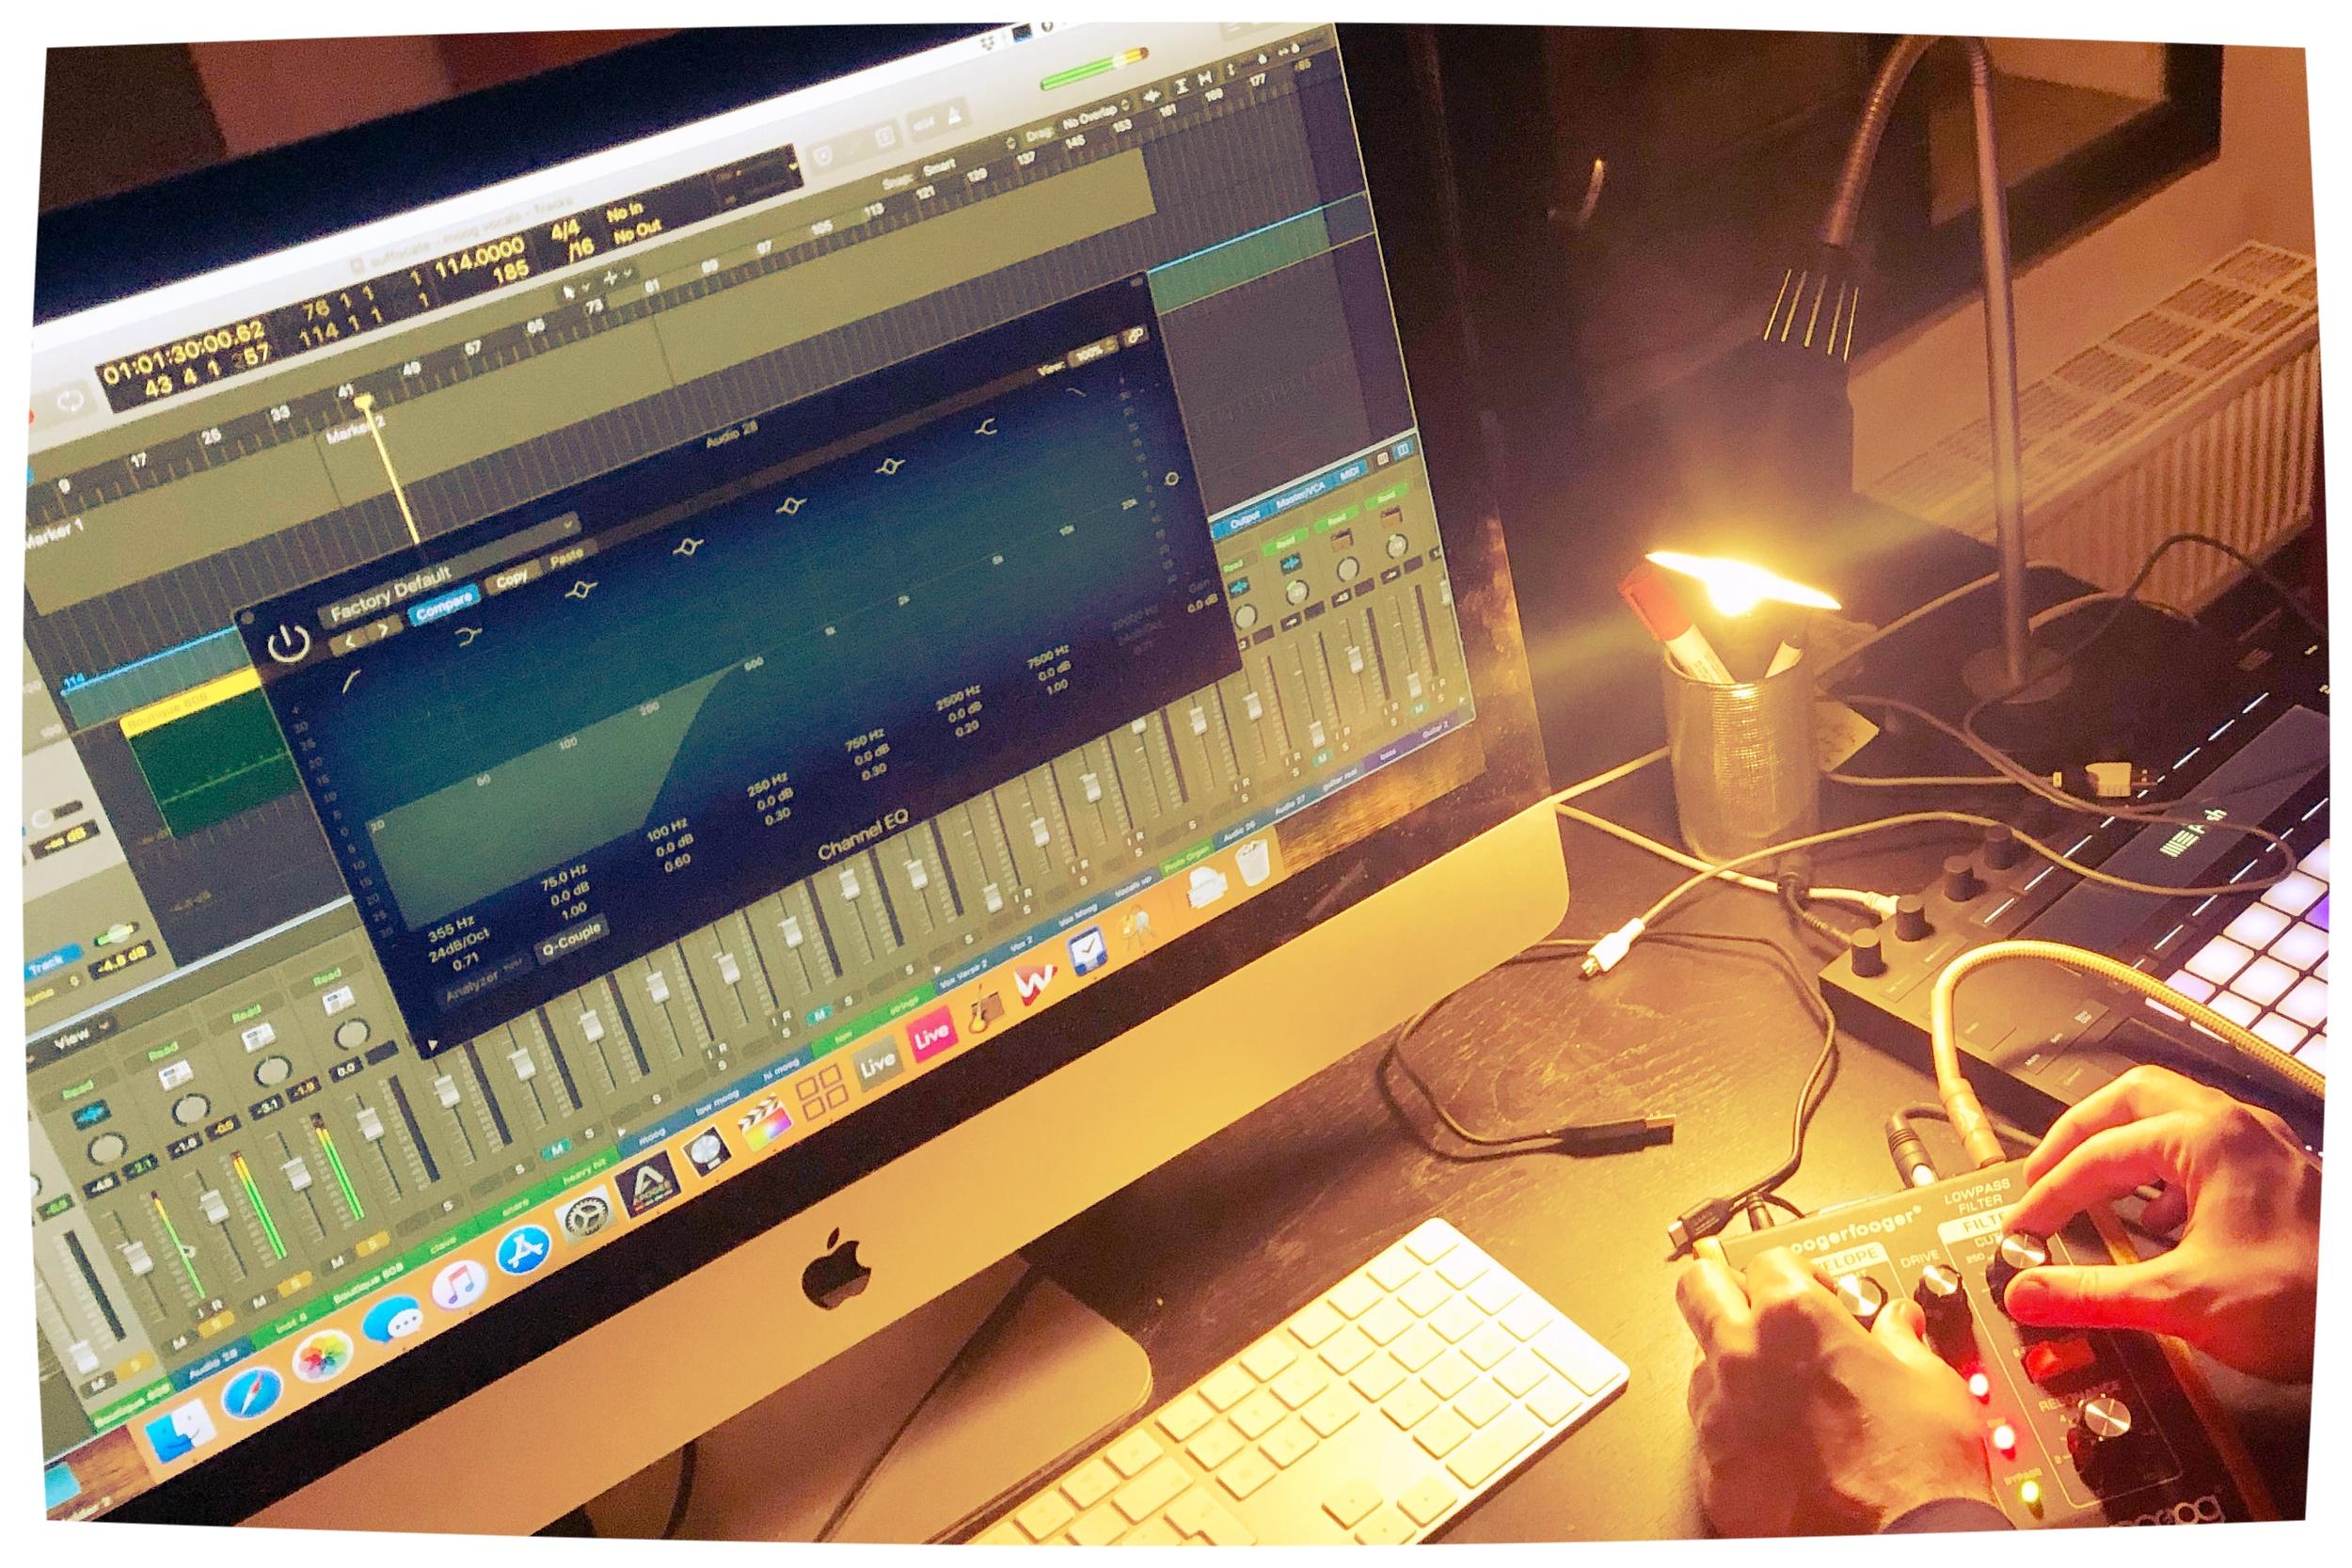 Software - Logic Pro XAbleton Live 10 & Push 2Wavelab 9.5Soundtoys 5GoodhertzValhalla Reverbs